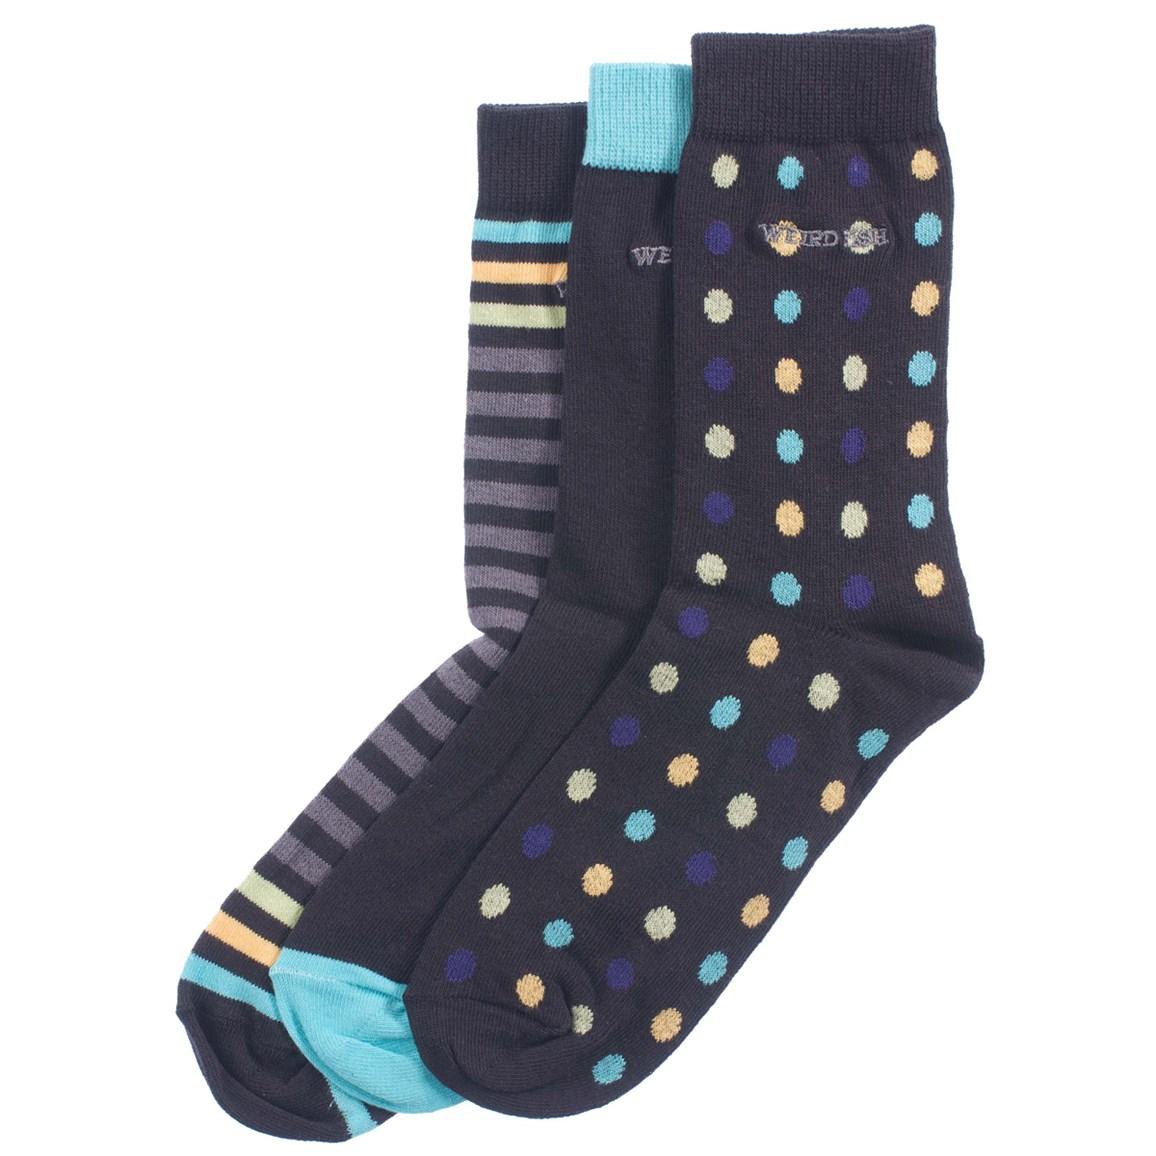 Weird Fish Balta 3 Pack of Socks Multi